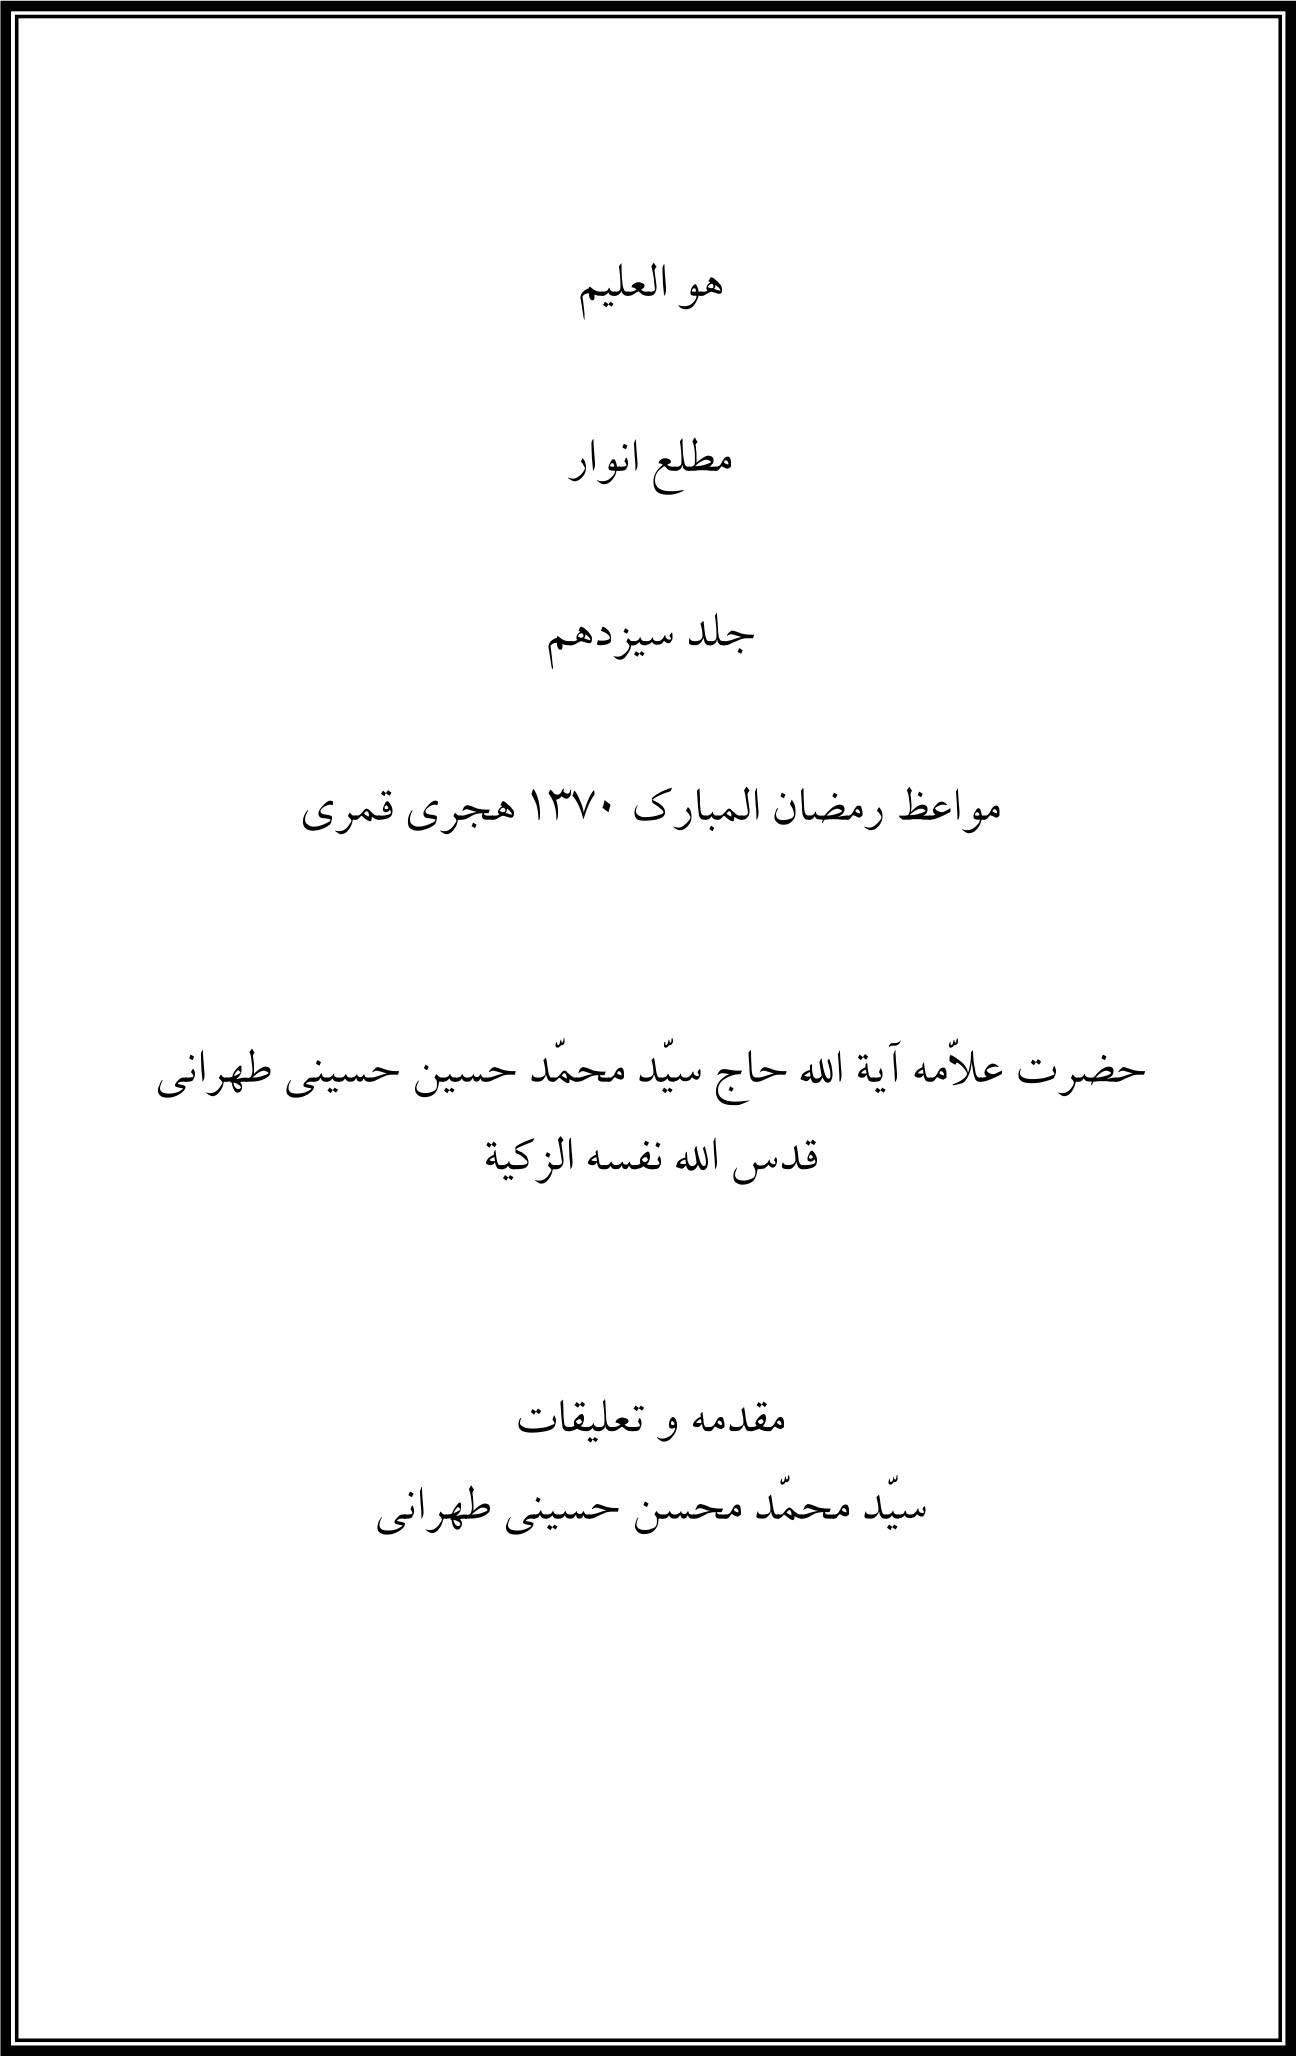 مطلع انوار ،جلد 13، علامه طهرانی